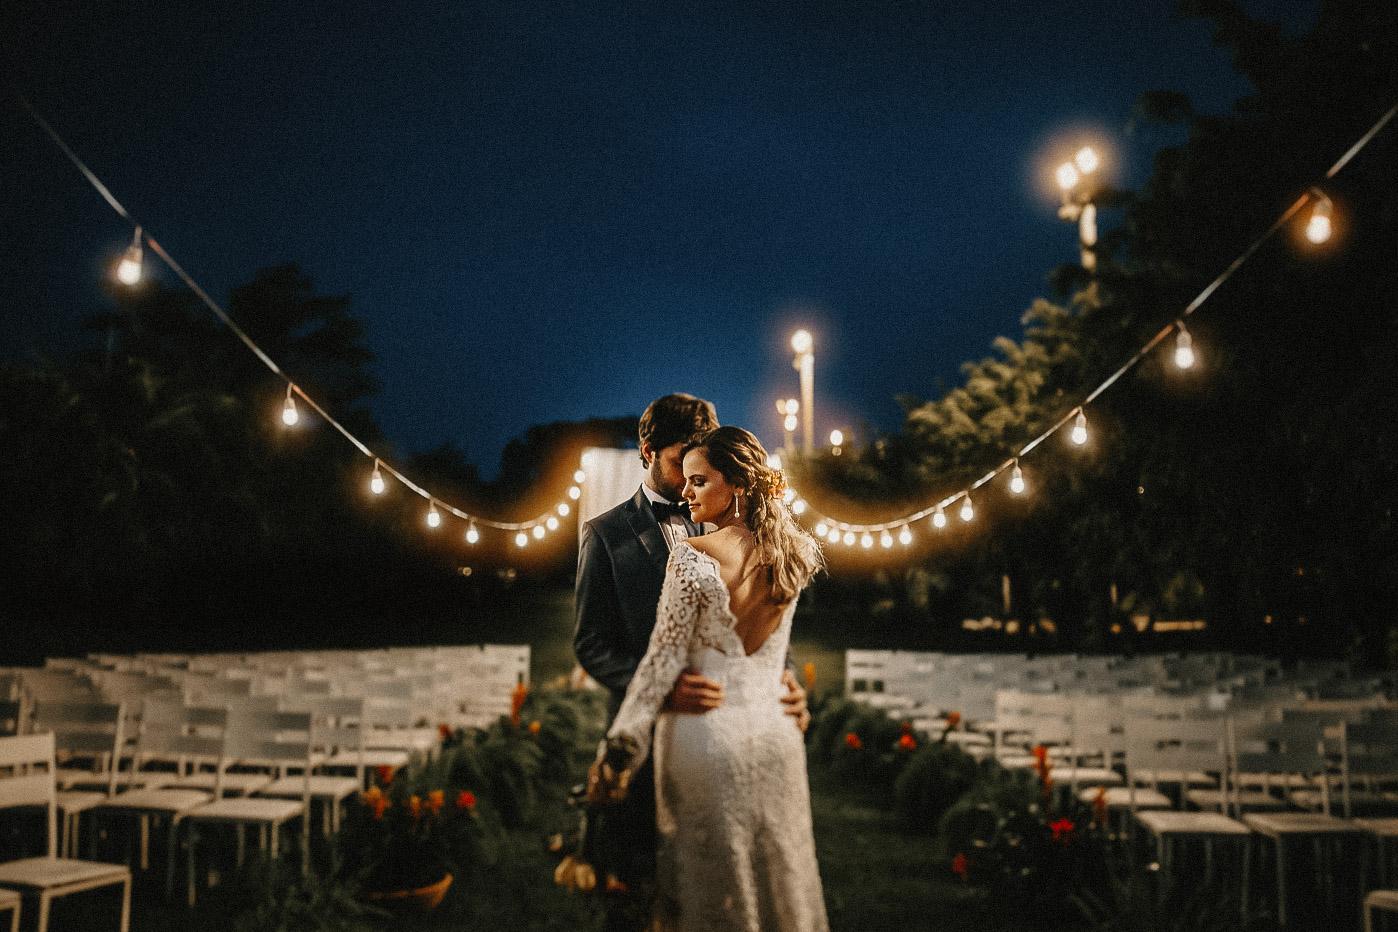 best irish wedding photographer - elopement ireland - dublin wedding photographer - irish wedding photographer - -62.jpg